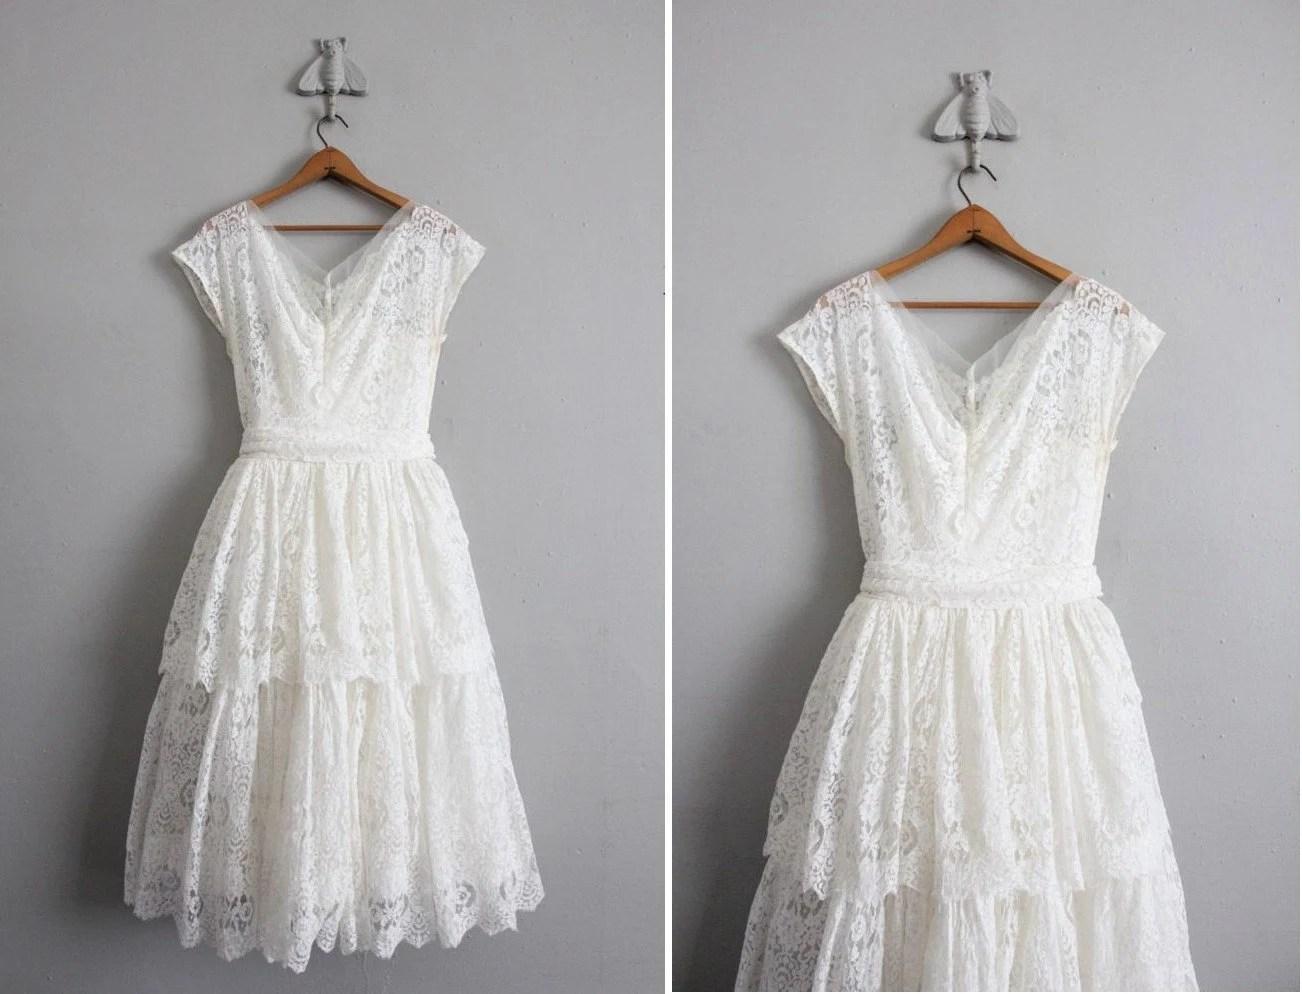 1950s Vintage White Lace Wedding Dress